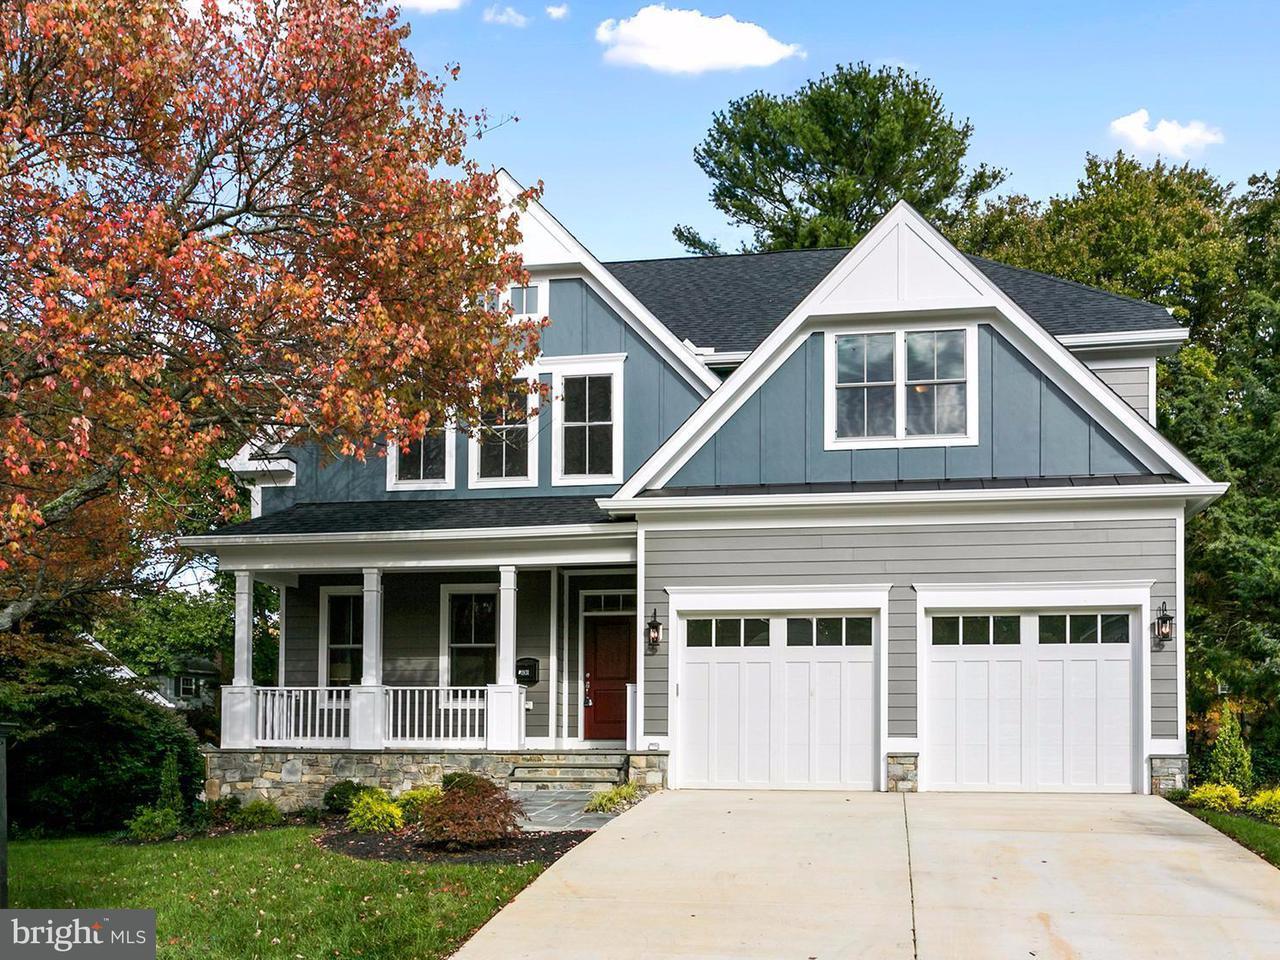 Single Family Home for Sale at 1931 Beaver Lane 1931 Beaver Lane McLean, Virginia 22101 United States